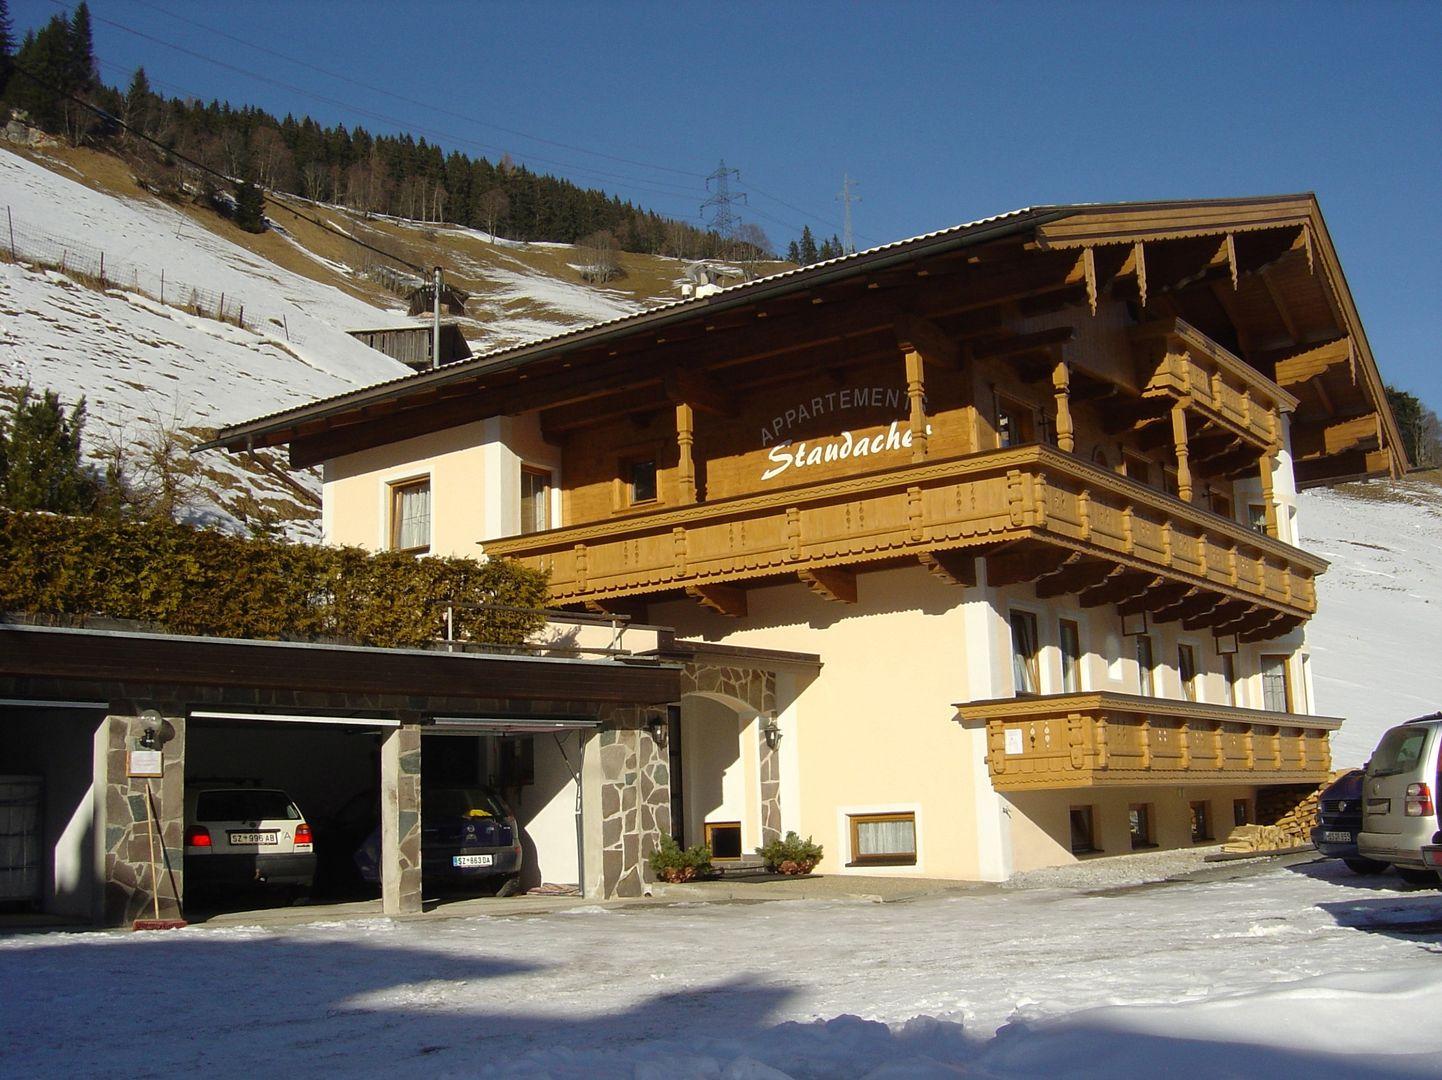 Landhaus Staudacher